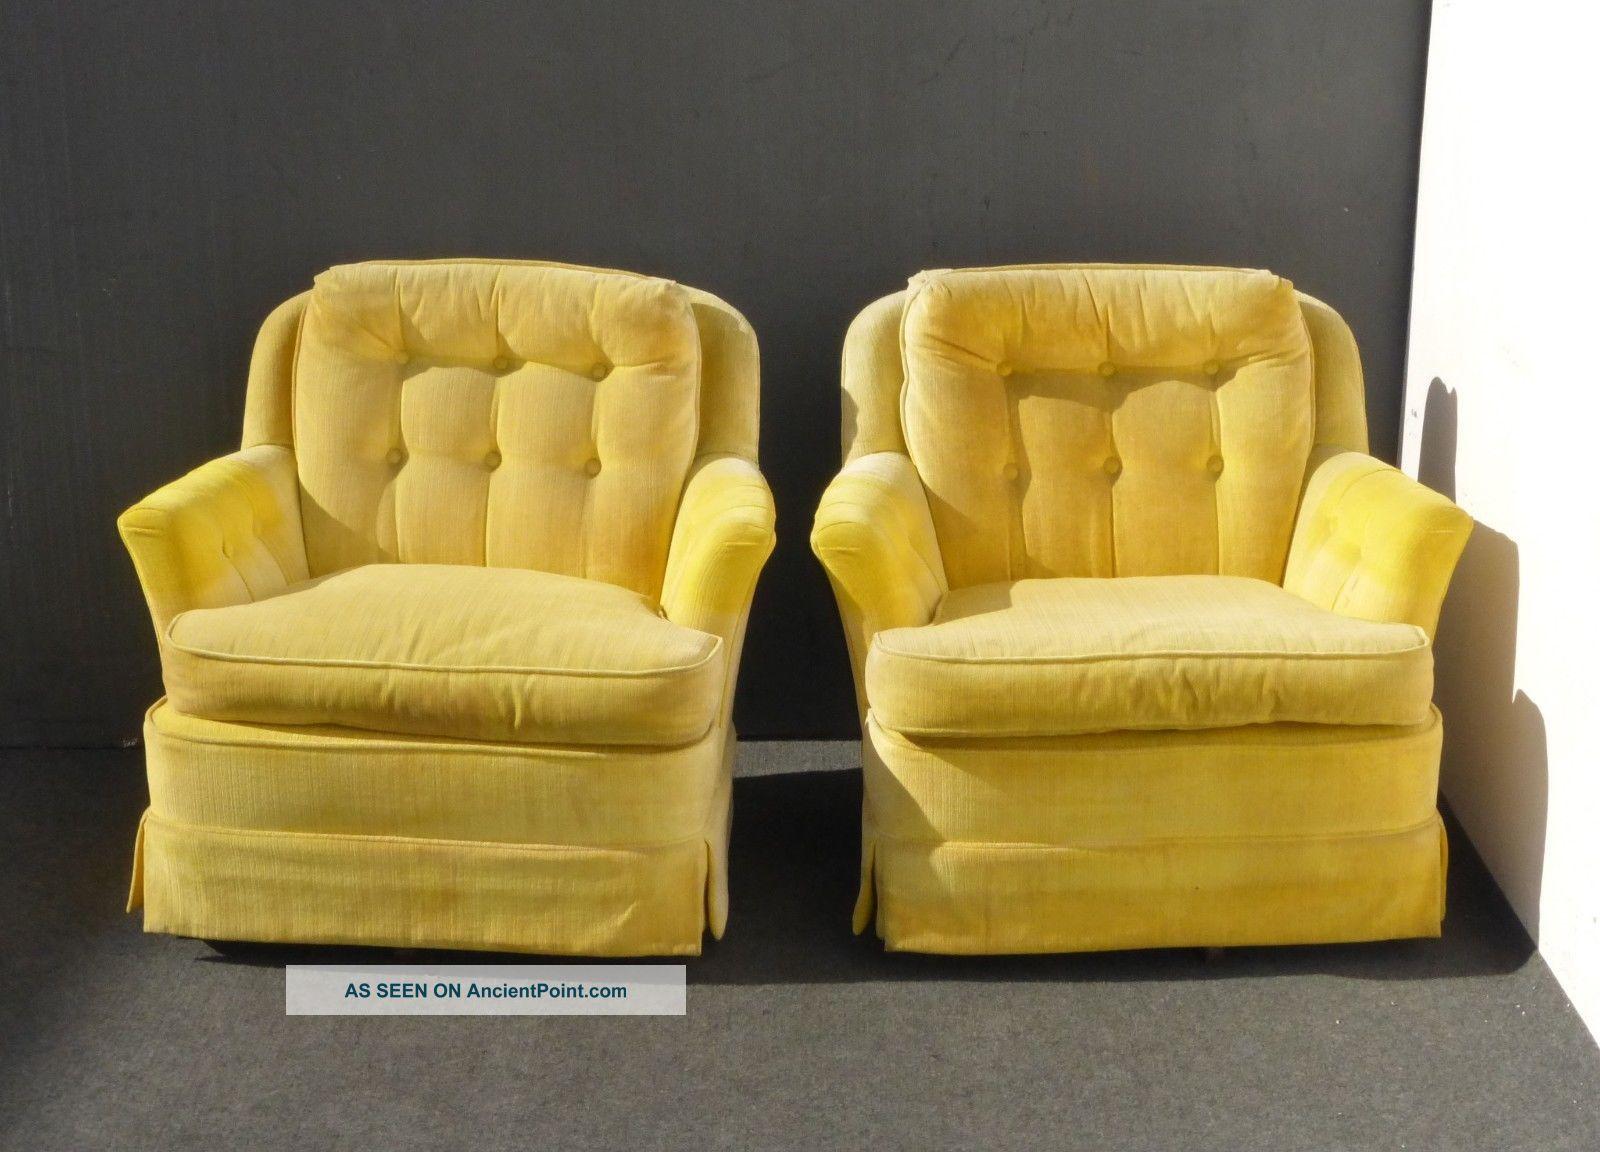 marge carson chairs hardwood chair mat diy pair vintage mid century yellow swivel arm hollywood regency